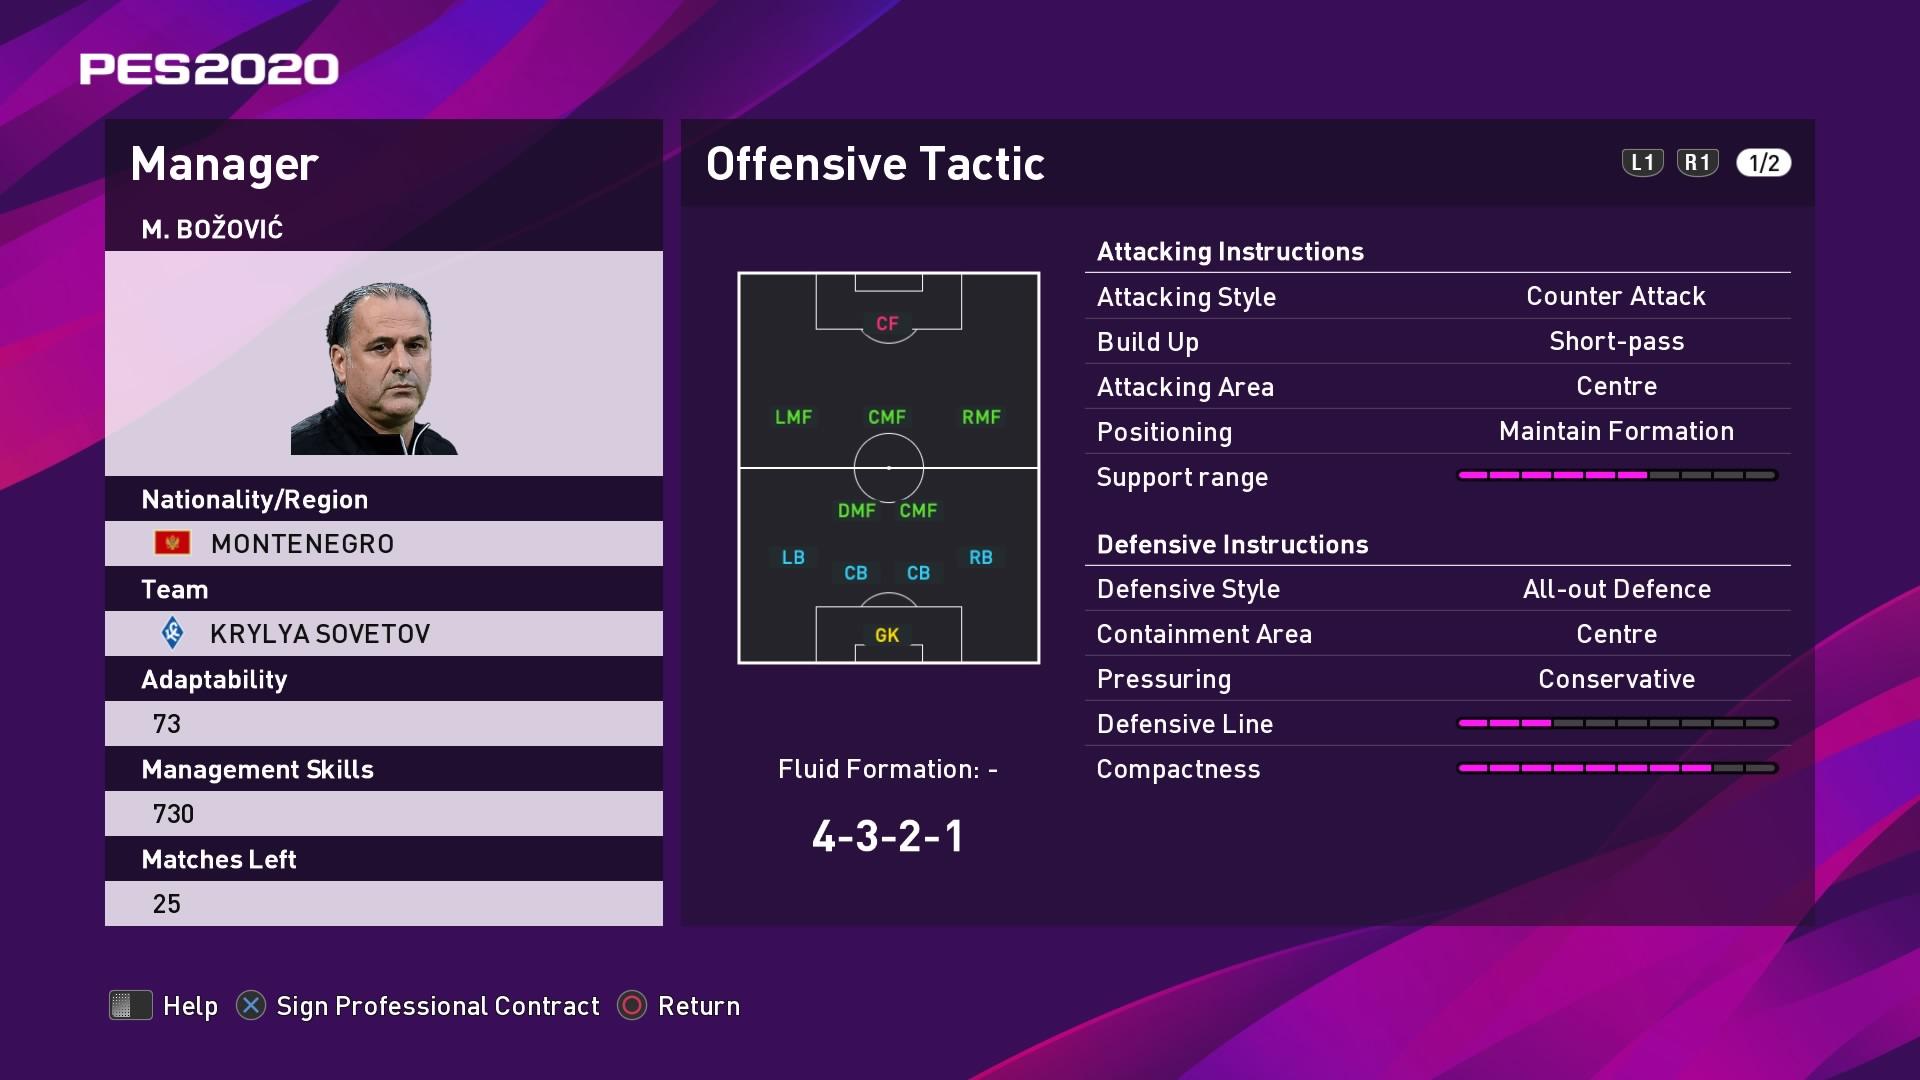 M. Bozovic (Miodrag Božović) Offensive Tactic in PES 2020 myClub